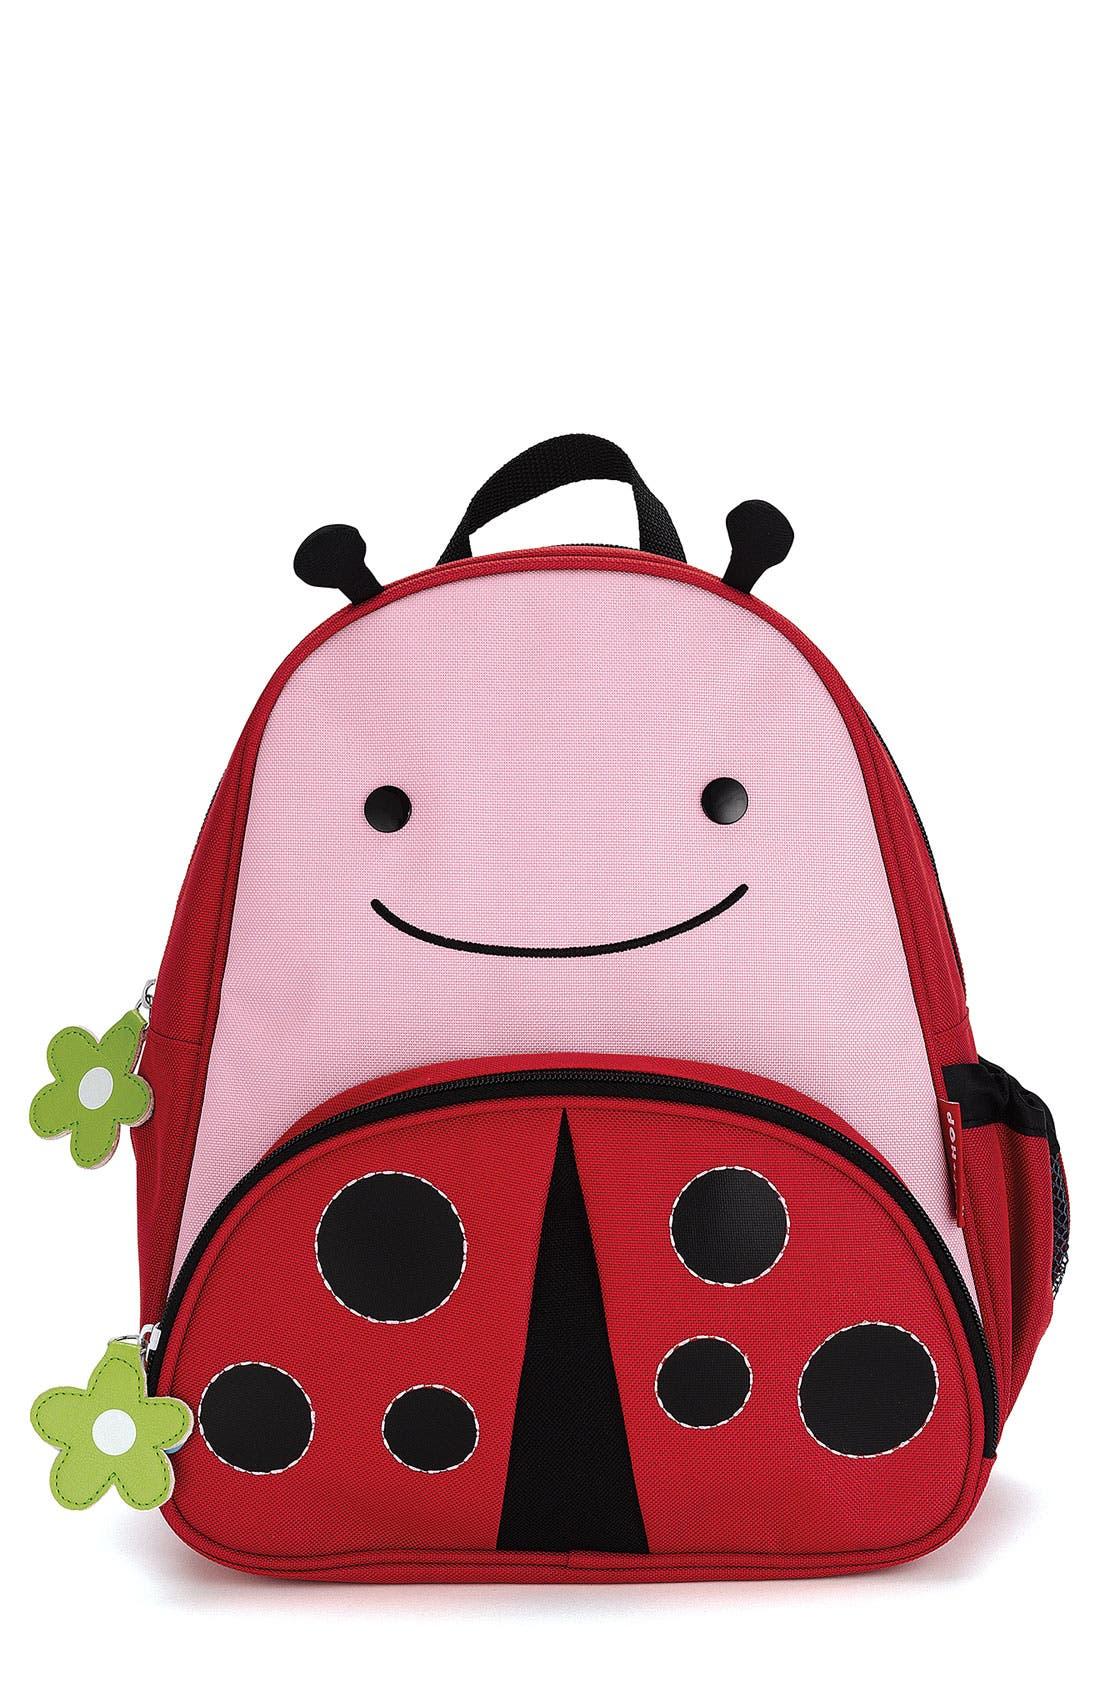 Main Image - Skip Hop Zoo Pack Backpack (Kids)